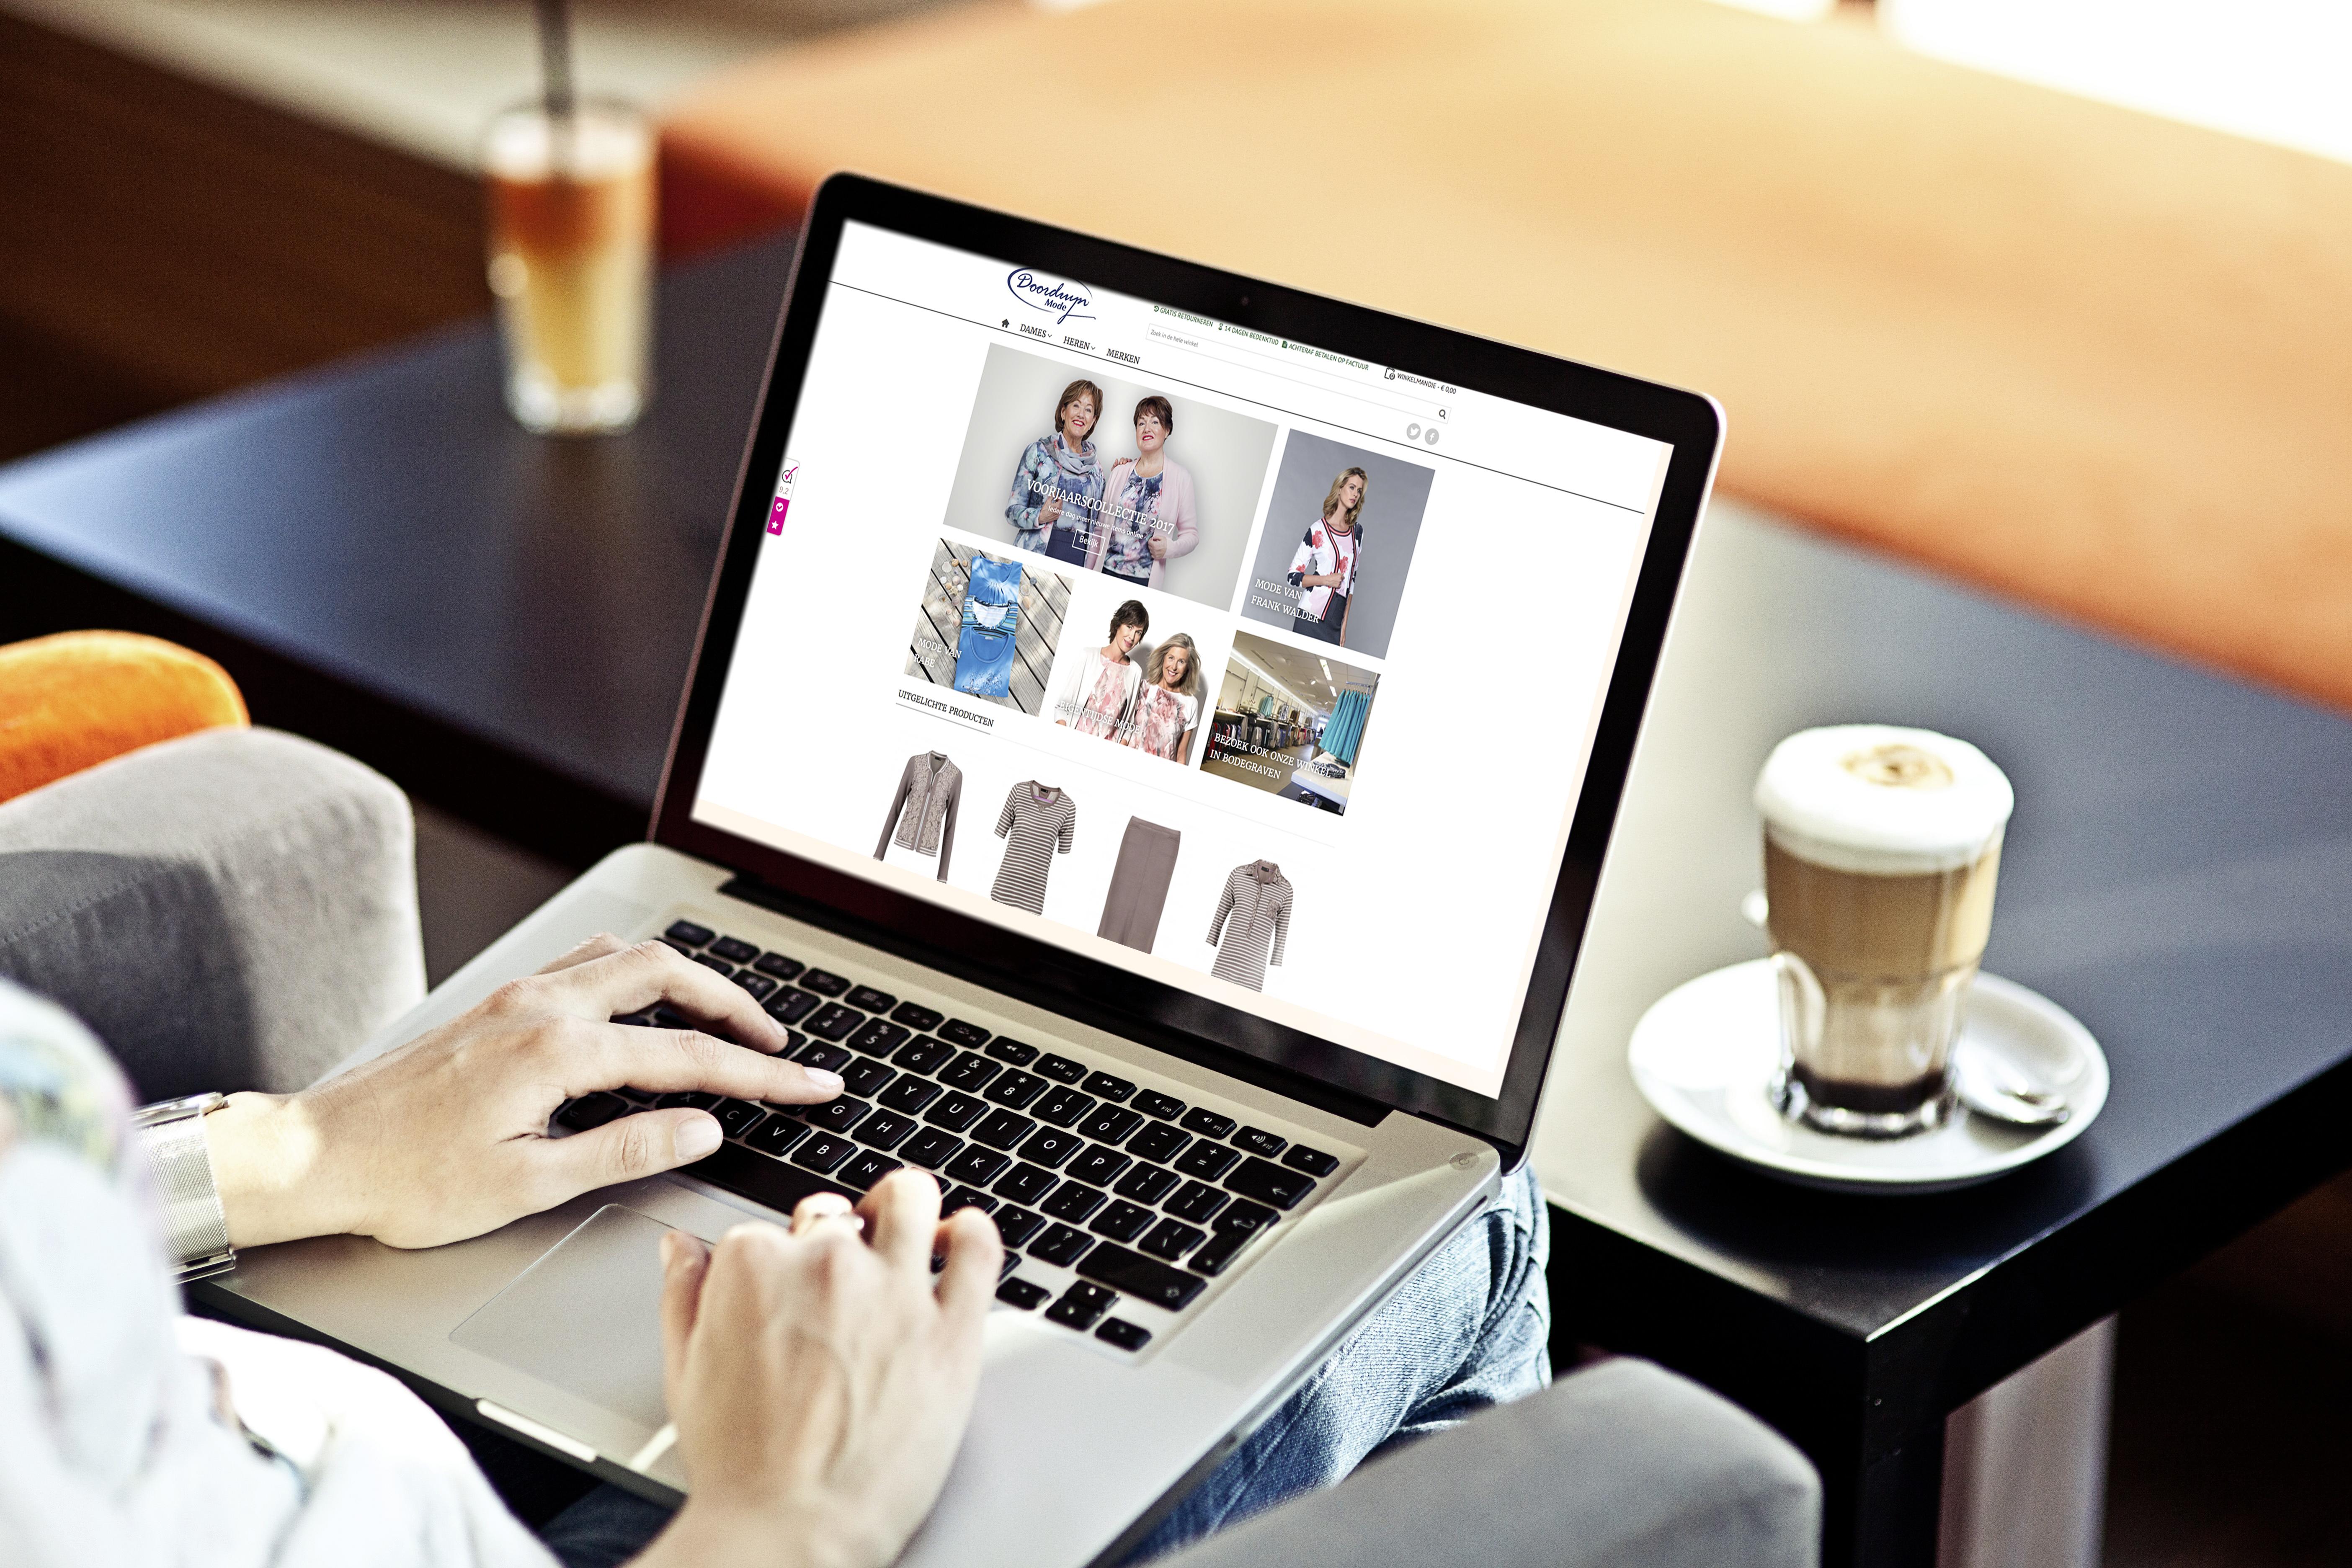 Dreamstar kleding online kopen